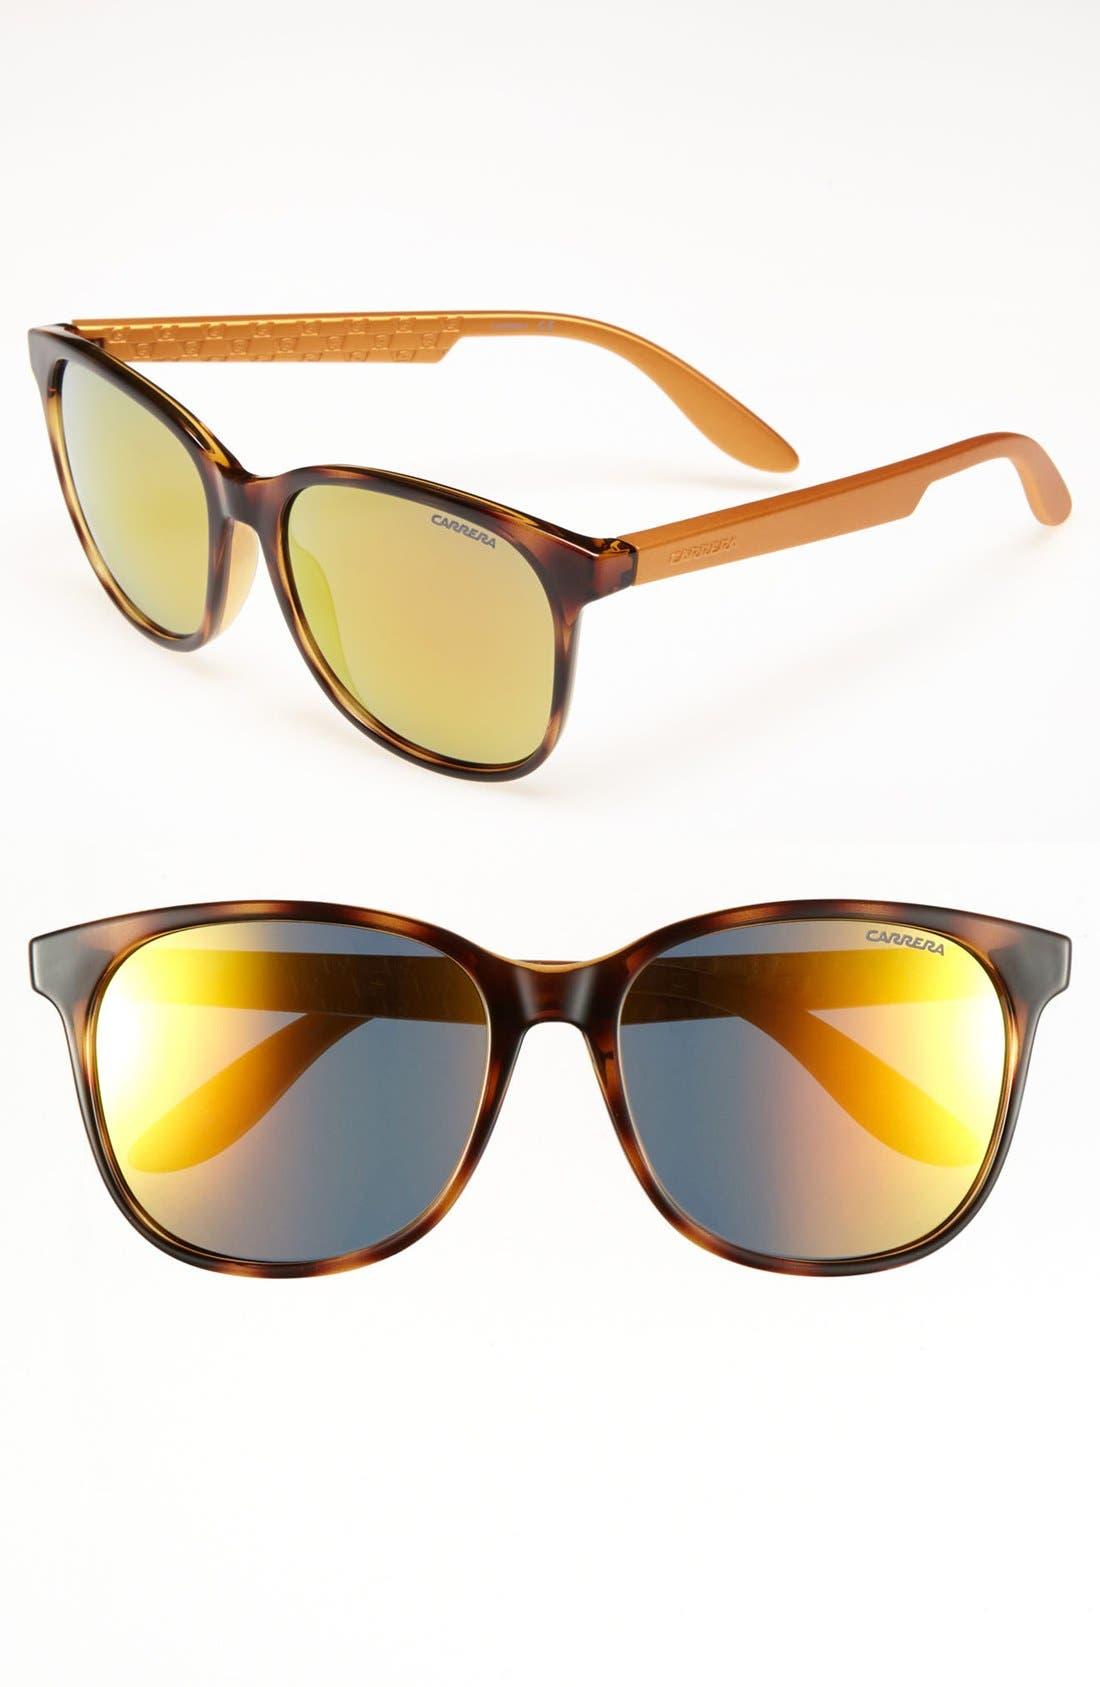 Main Image - Carrera Eyewear 56 mm Sunglasses